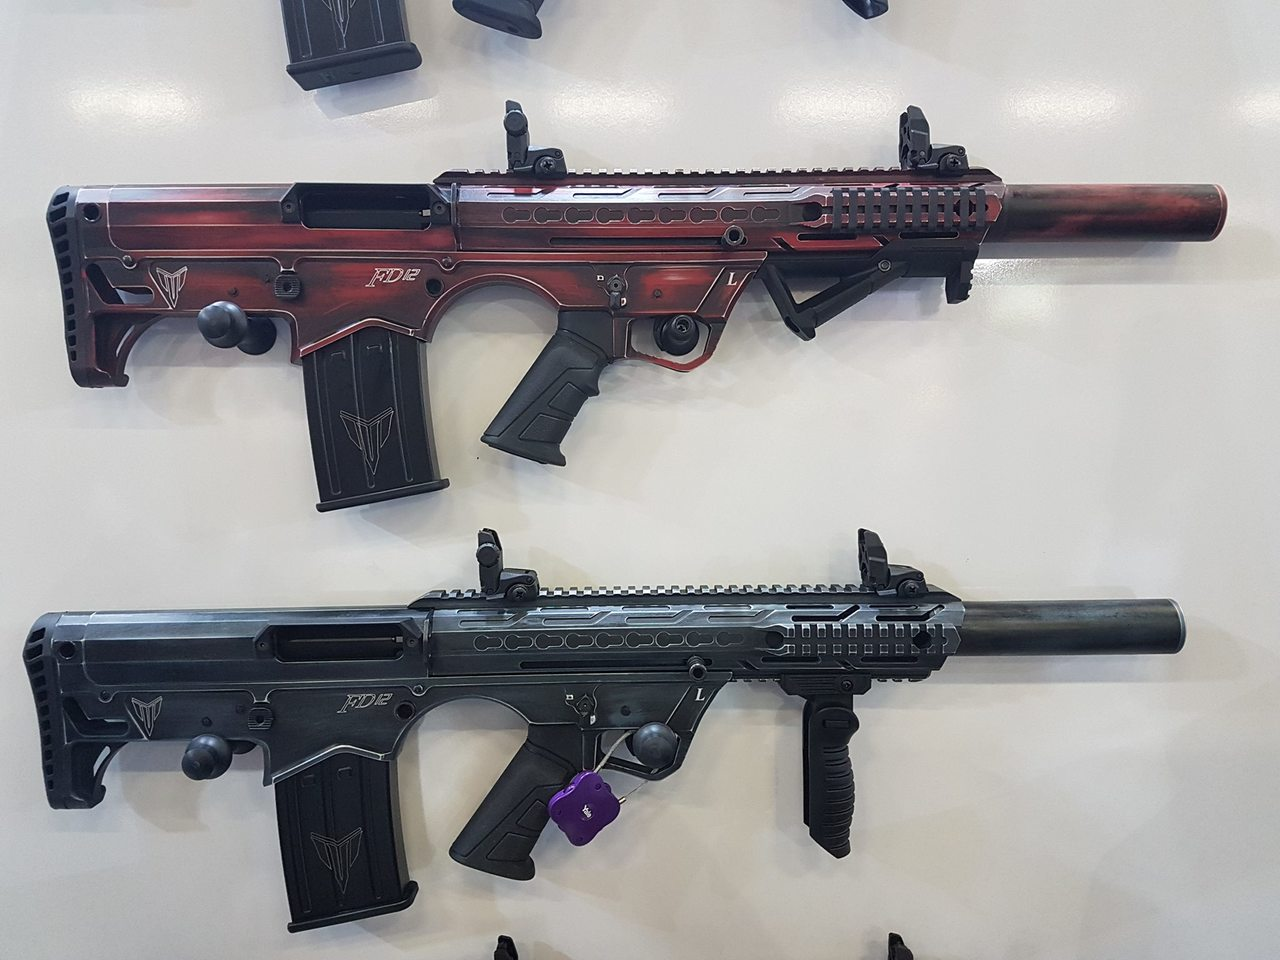 fd12_bullpup_shotgun__88141.1552934134.jpg?c=2